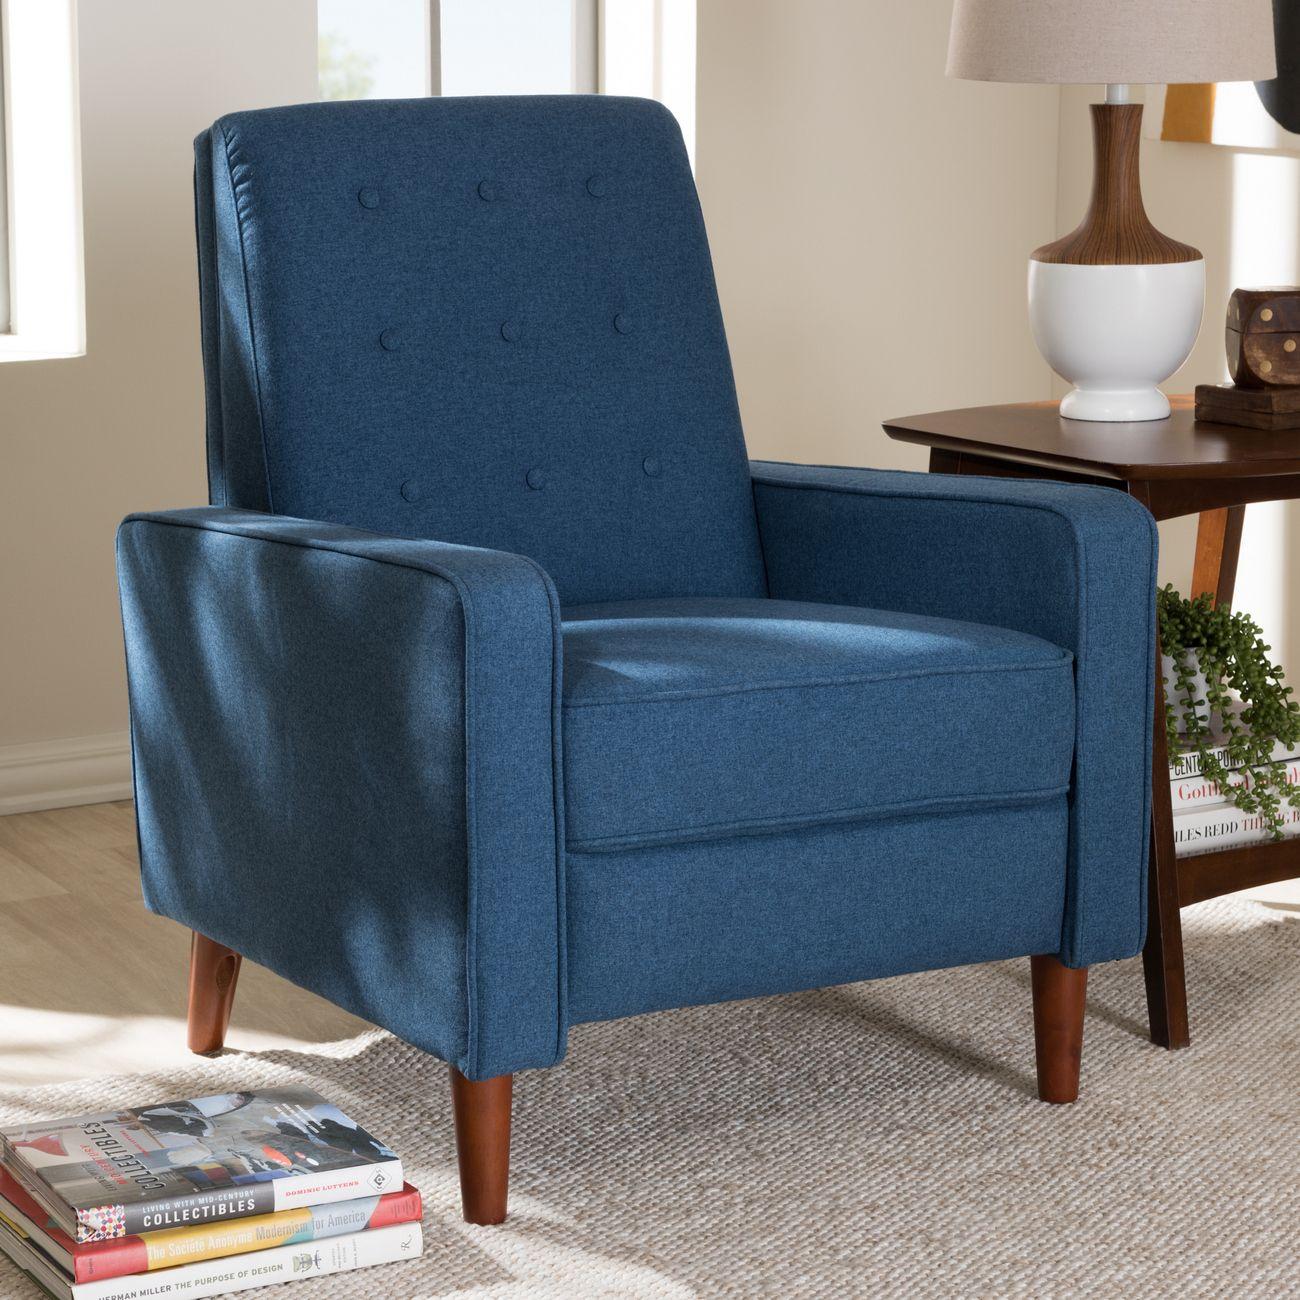 Baxton Studio Mathias Mid Century Modern Blue Fabric Upholstered Lounge Chair 1705 Blue